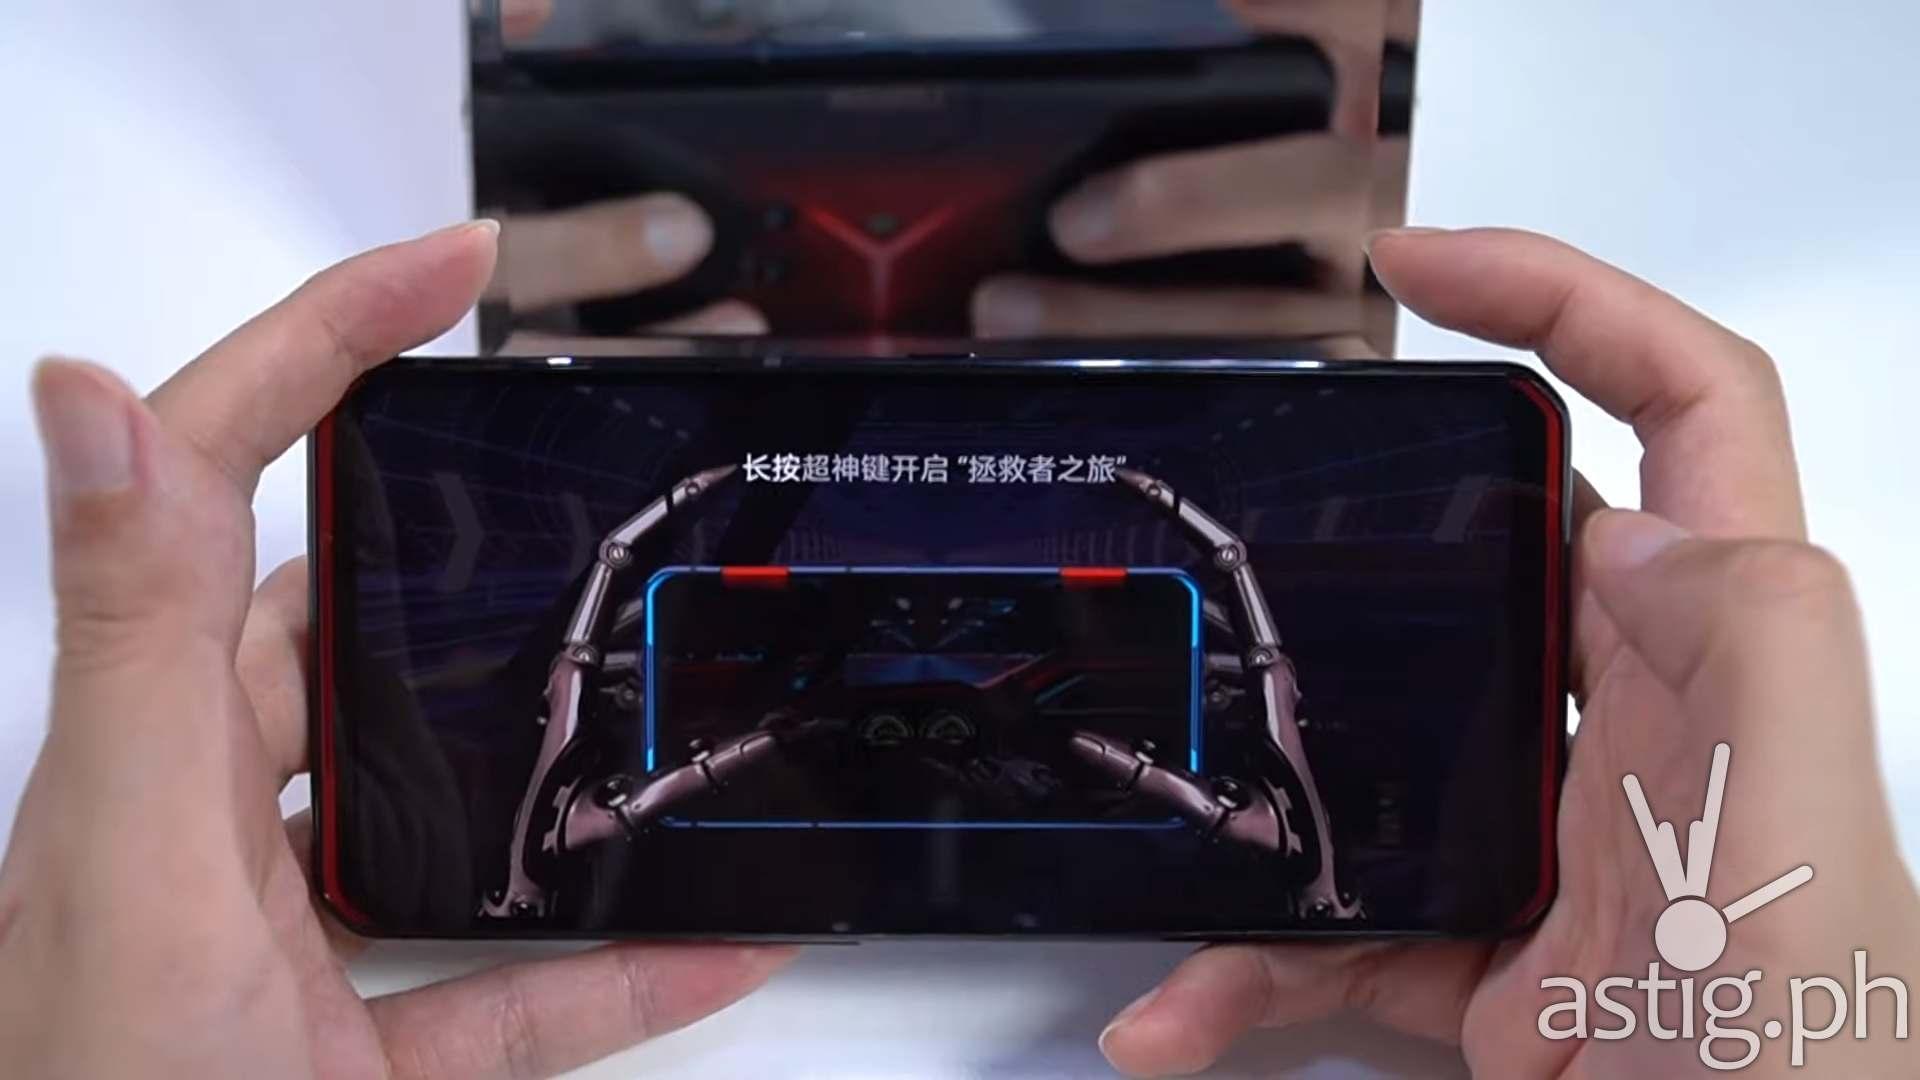 Front handheld - Lenovo Legion Phone Duel gaming smartphone